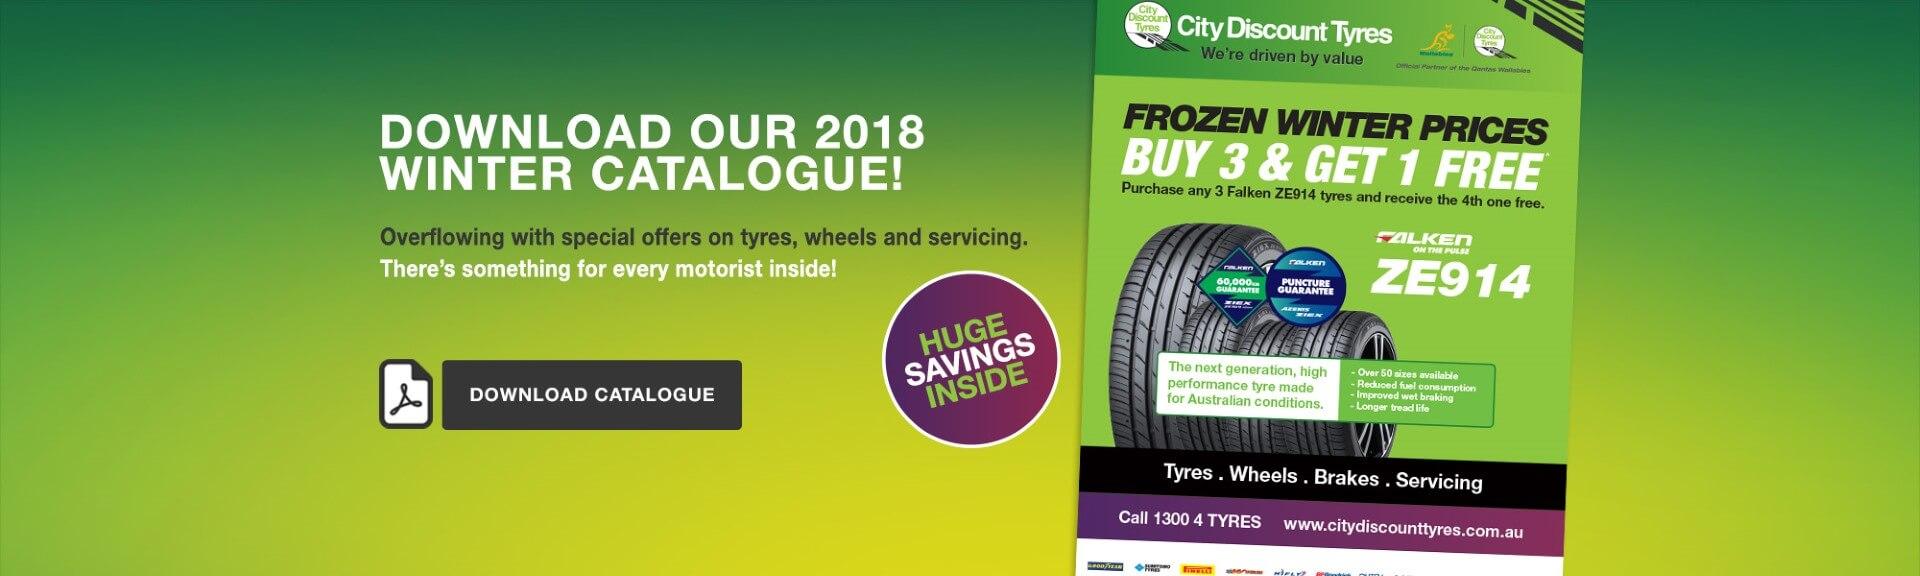 City Discount Tyres Winter Catalogue